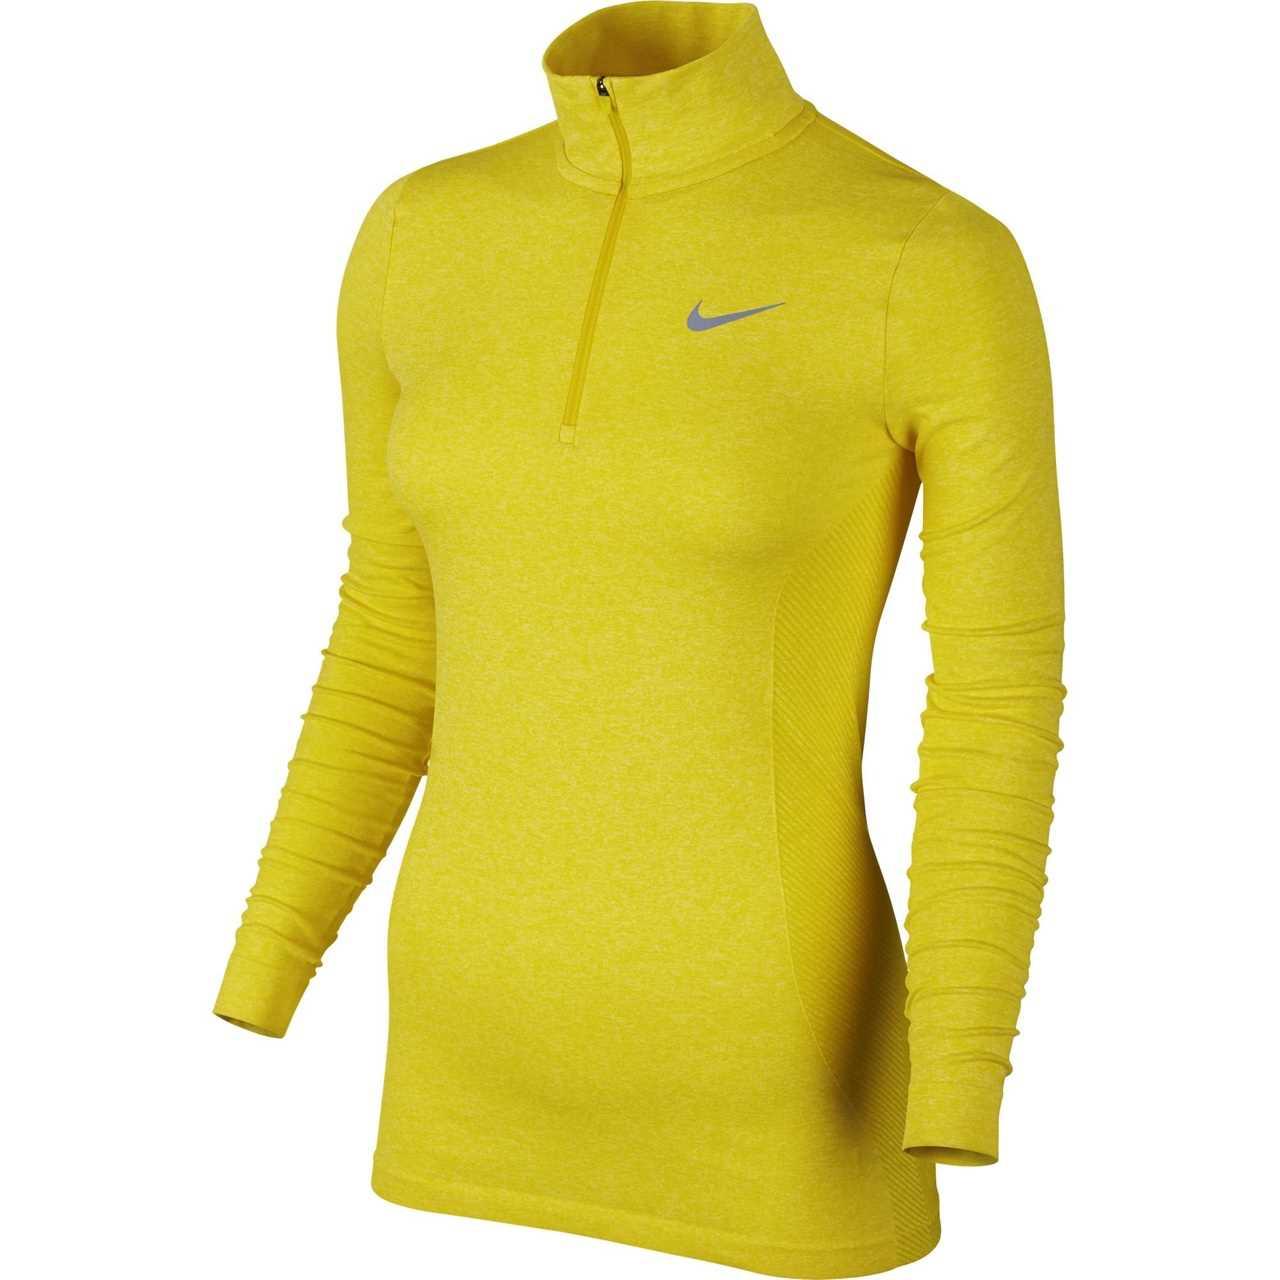 03783490735c Nike Golf Women s Dri-FIT Knit 1 2 Zip Top (Light Crimson) XS - Optic Yellow